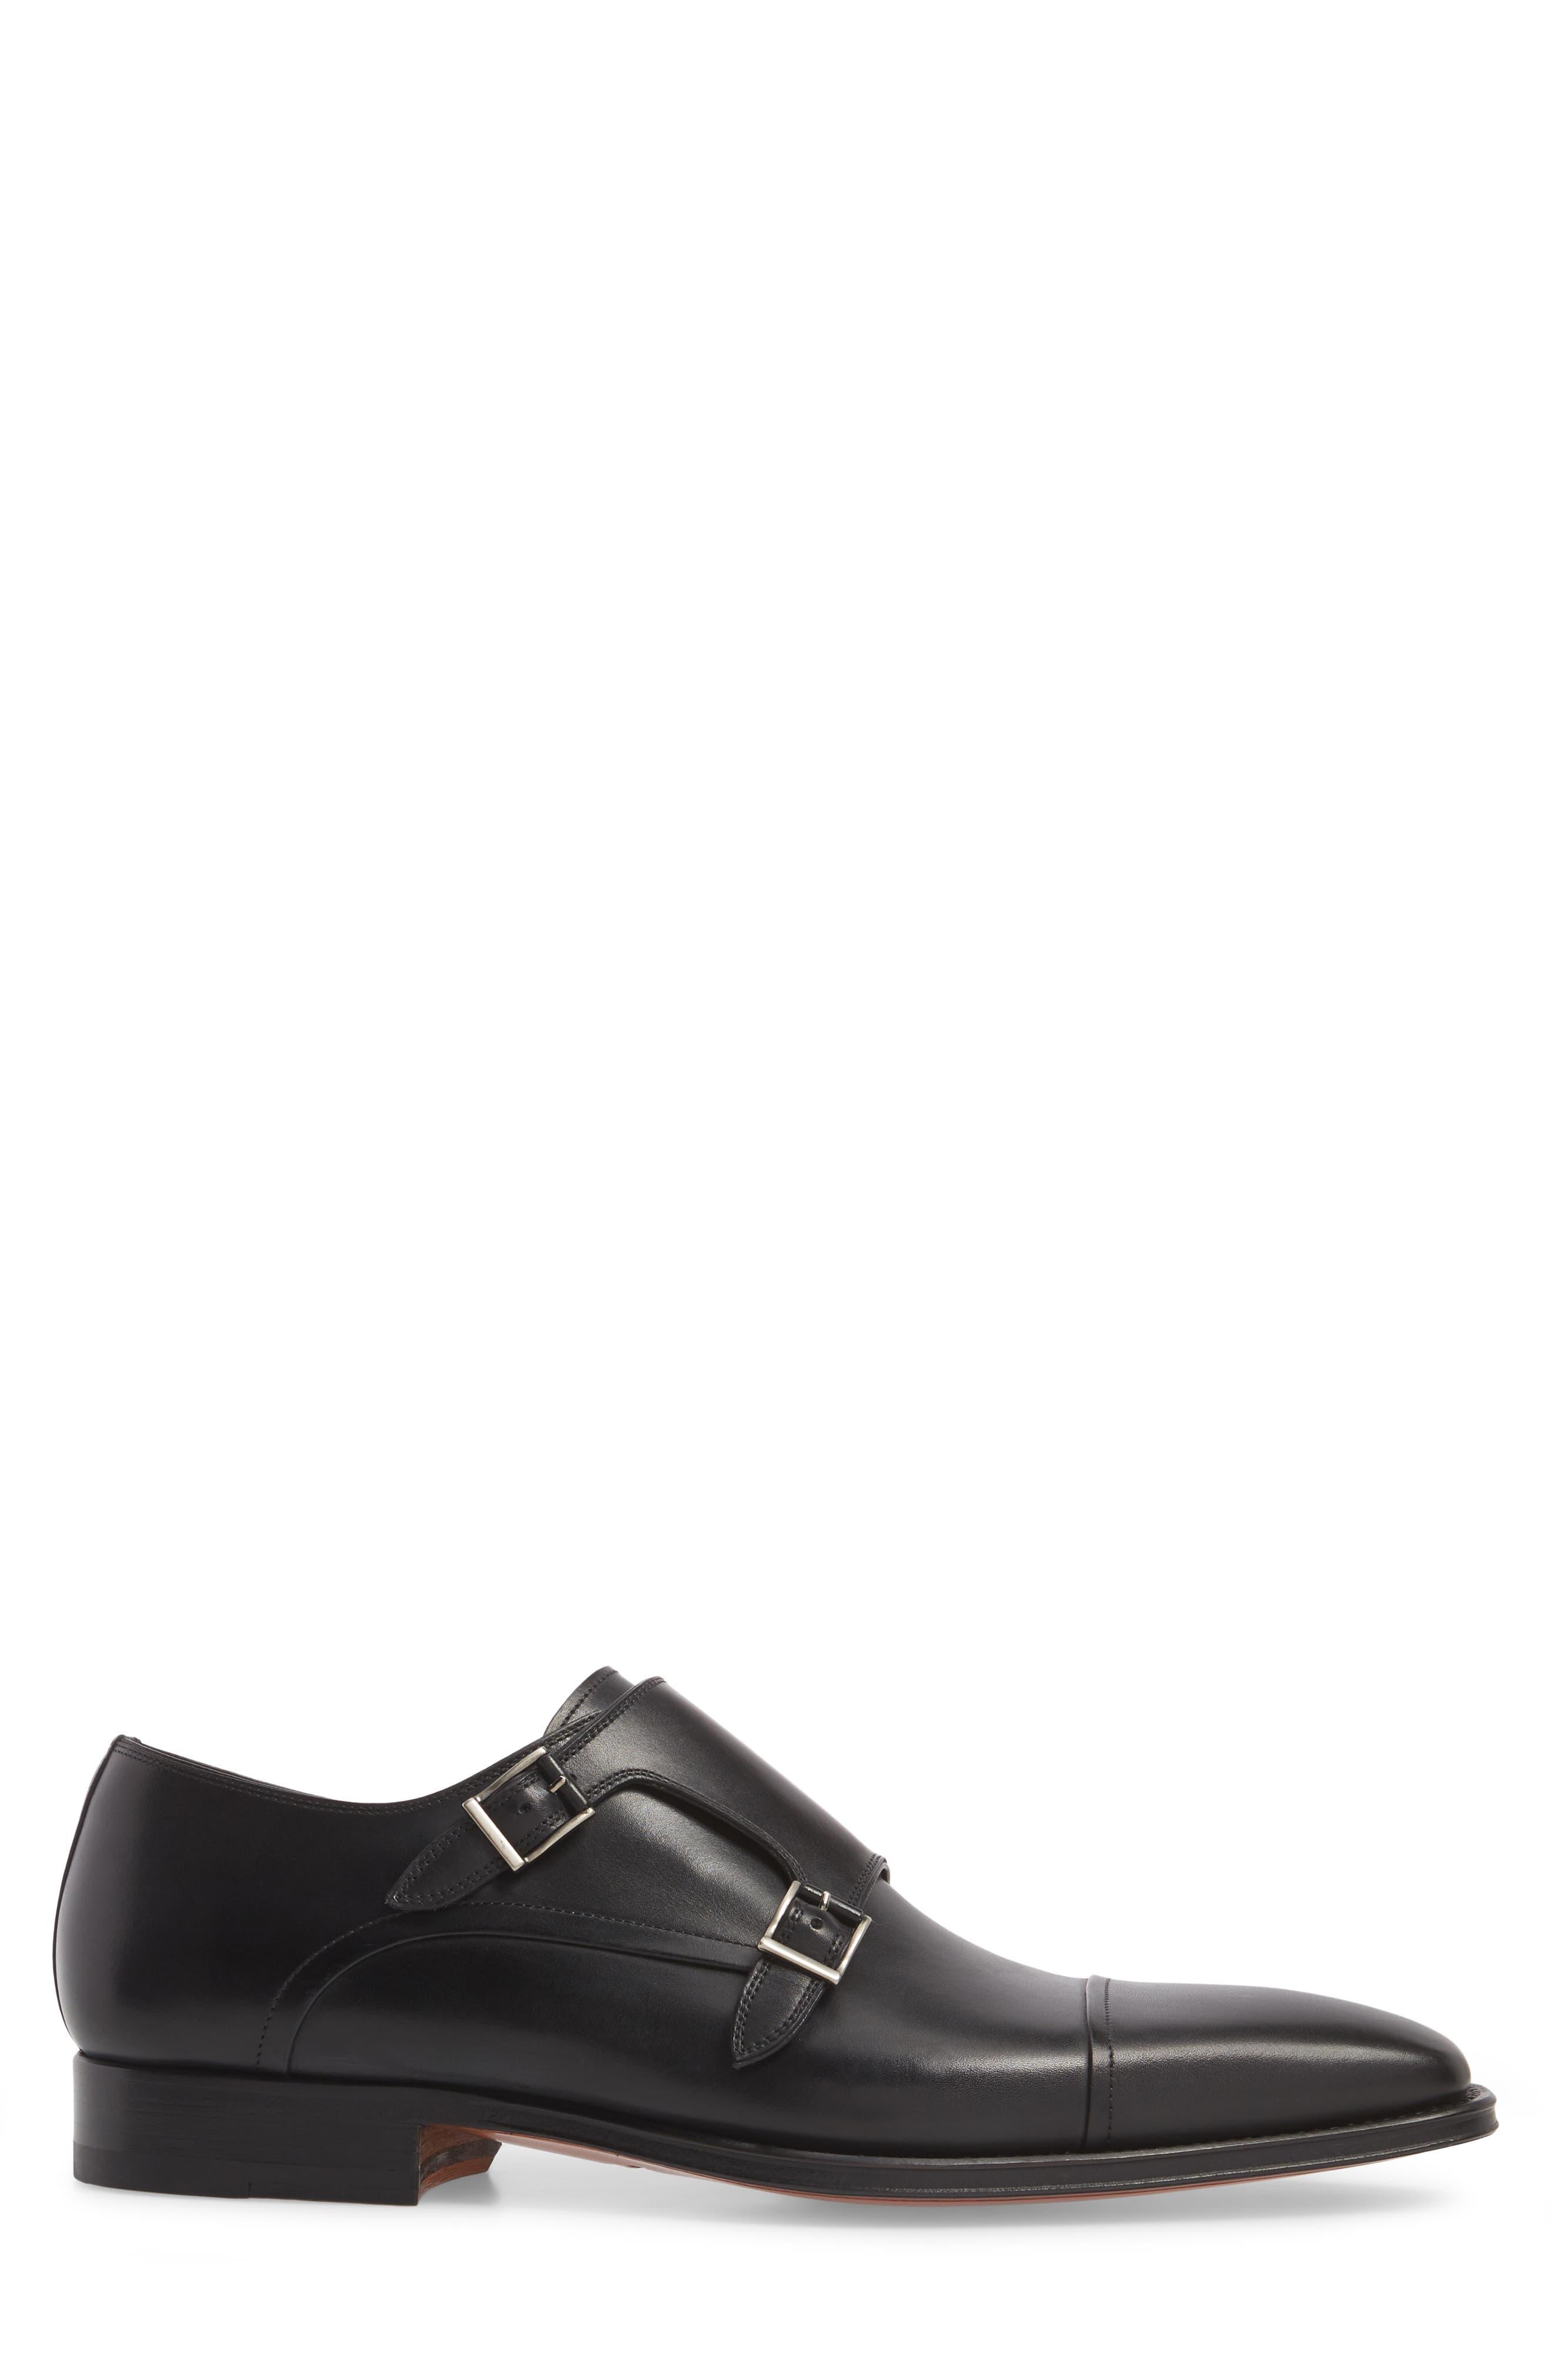 Silvio Double Monk Strap Shoe,                             Alternate thumbnail 3, color,                             Black Leather